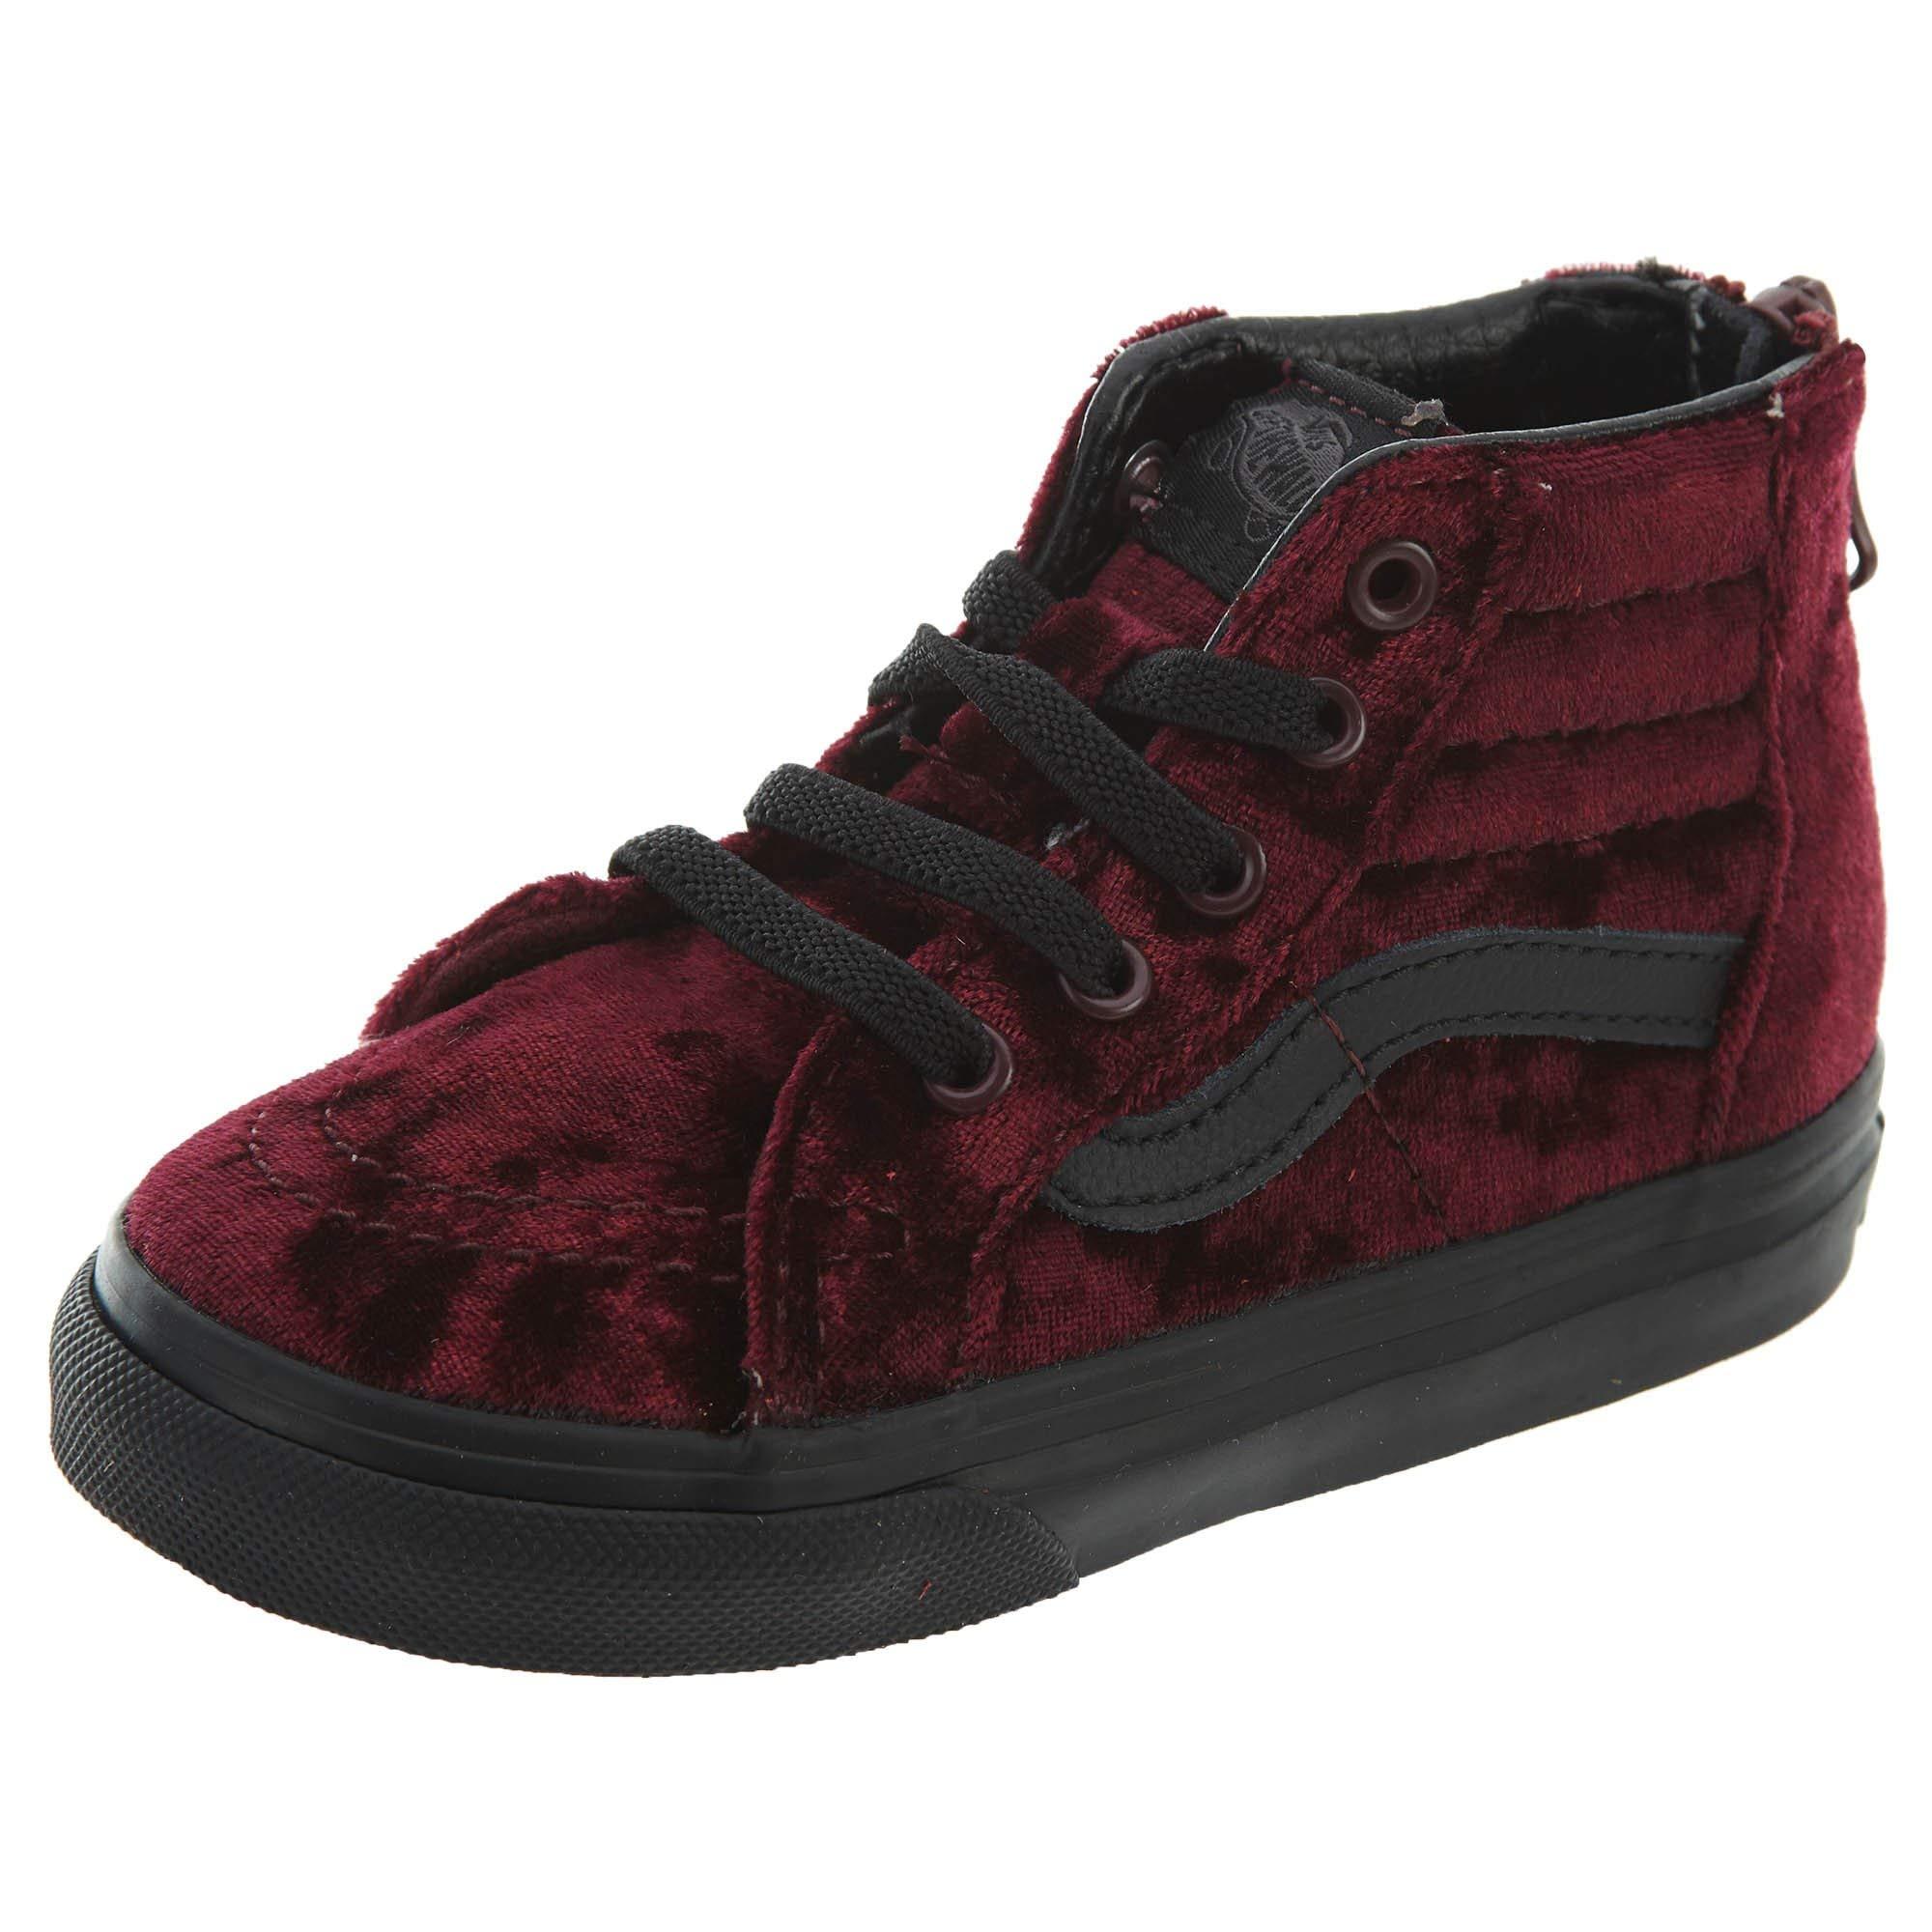 Vans SK8 HI ZIP Velvet Red/Black Toddler Girl Shoes 5.5